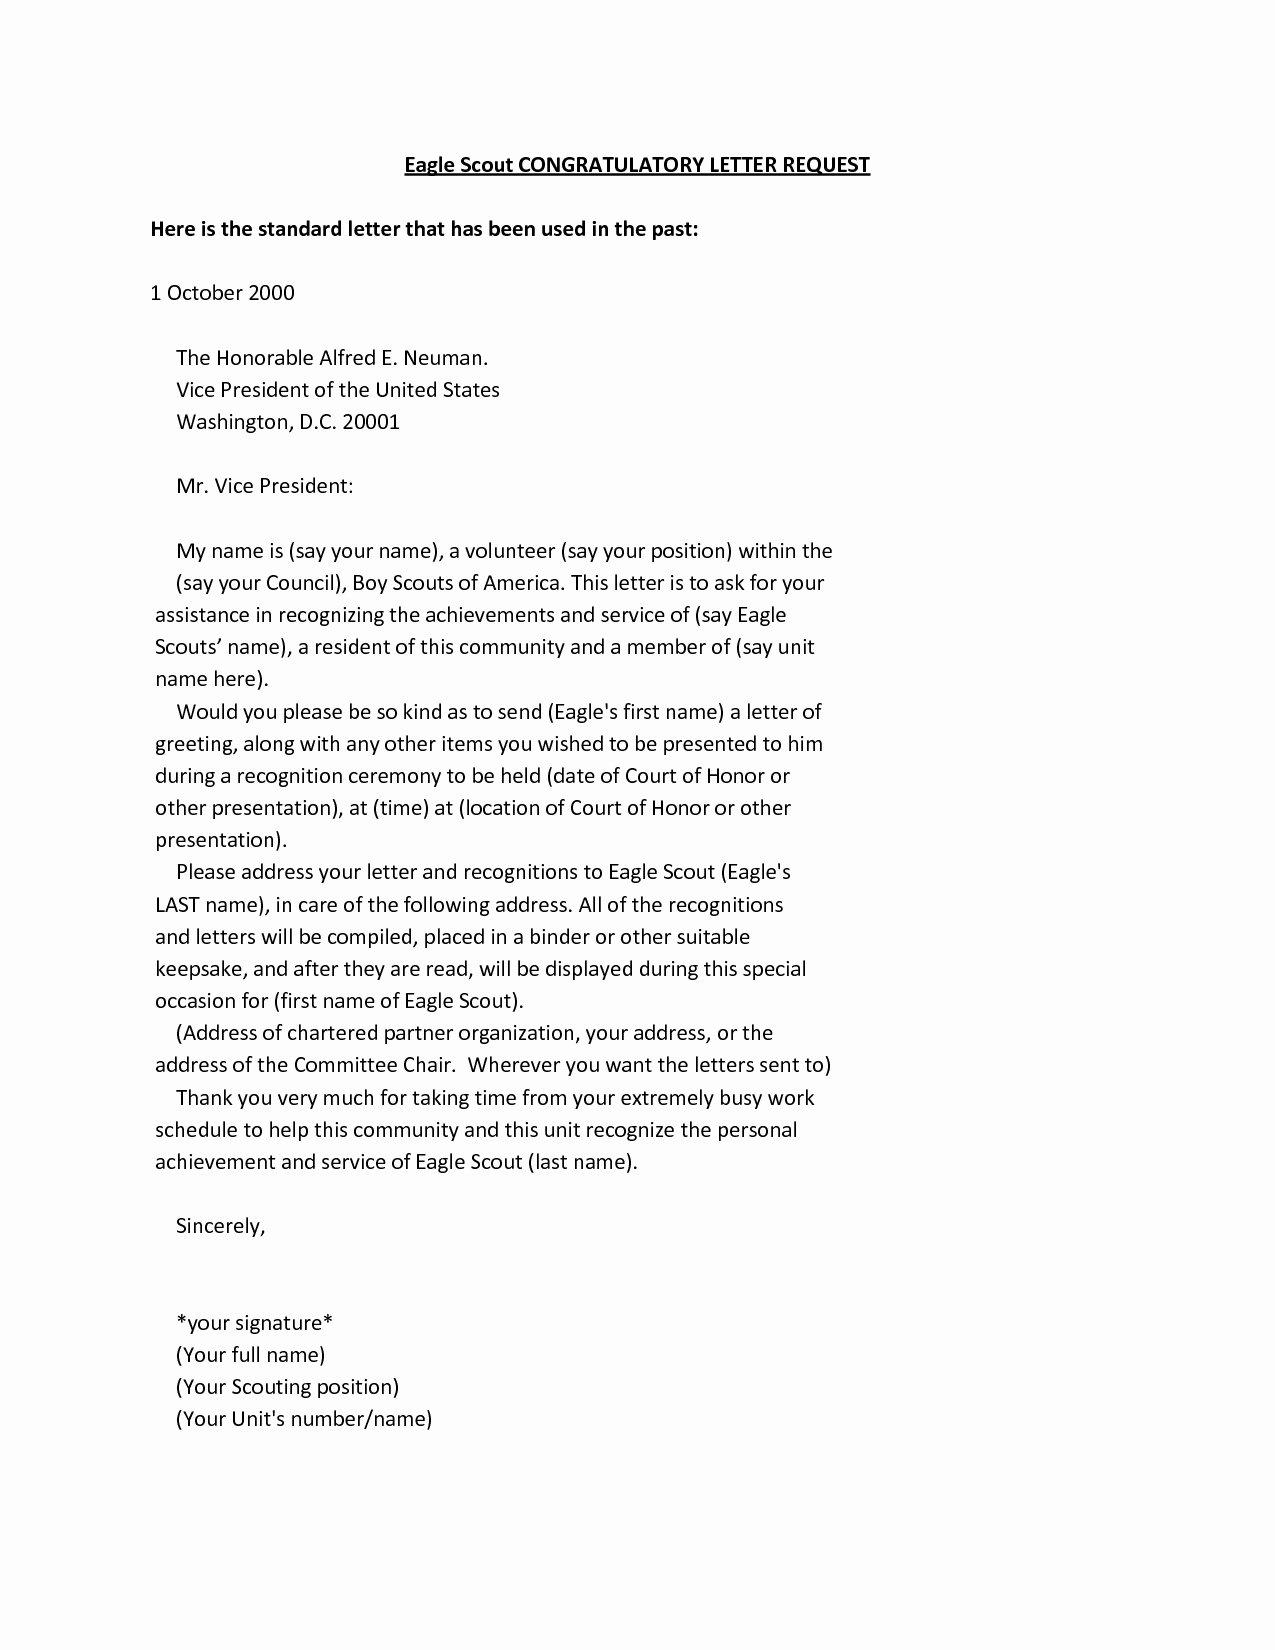 Sample Eagle Scout Recommendation Letter Luxury 10 Eagle Scout Letter Re Mendation Template